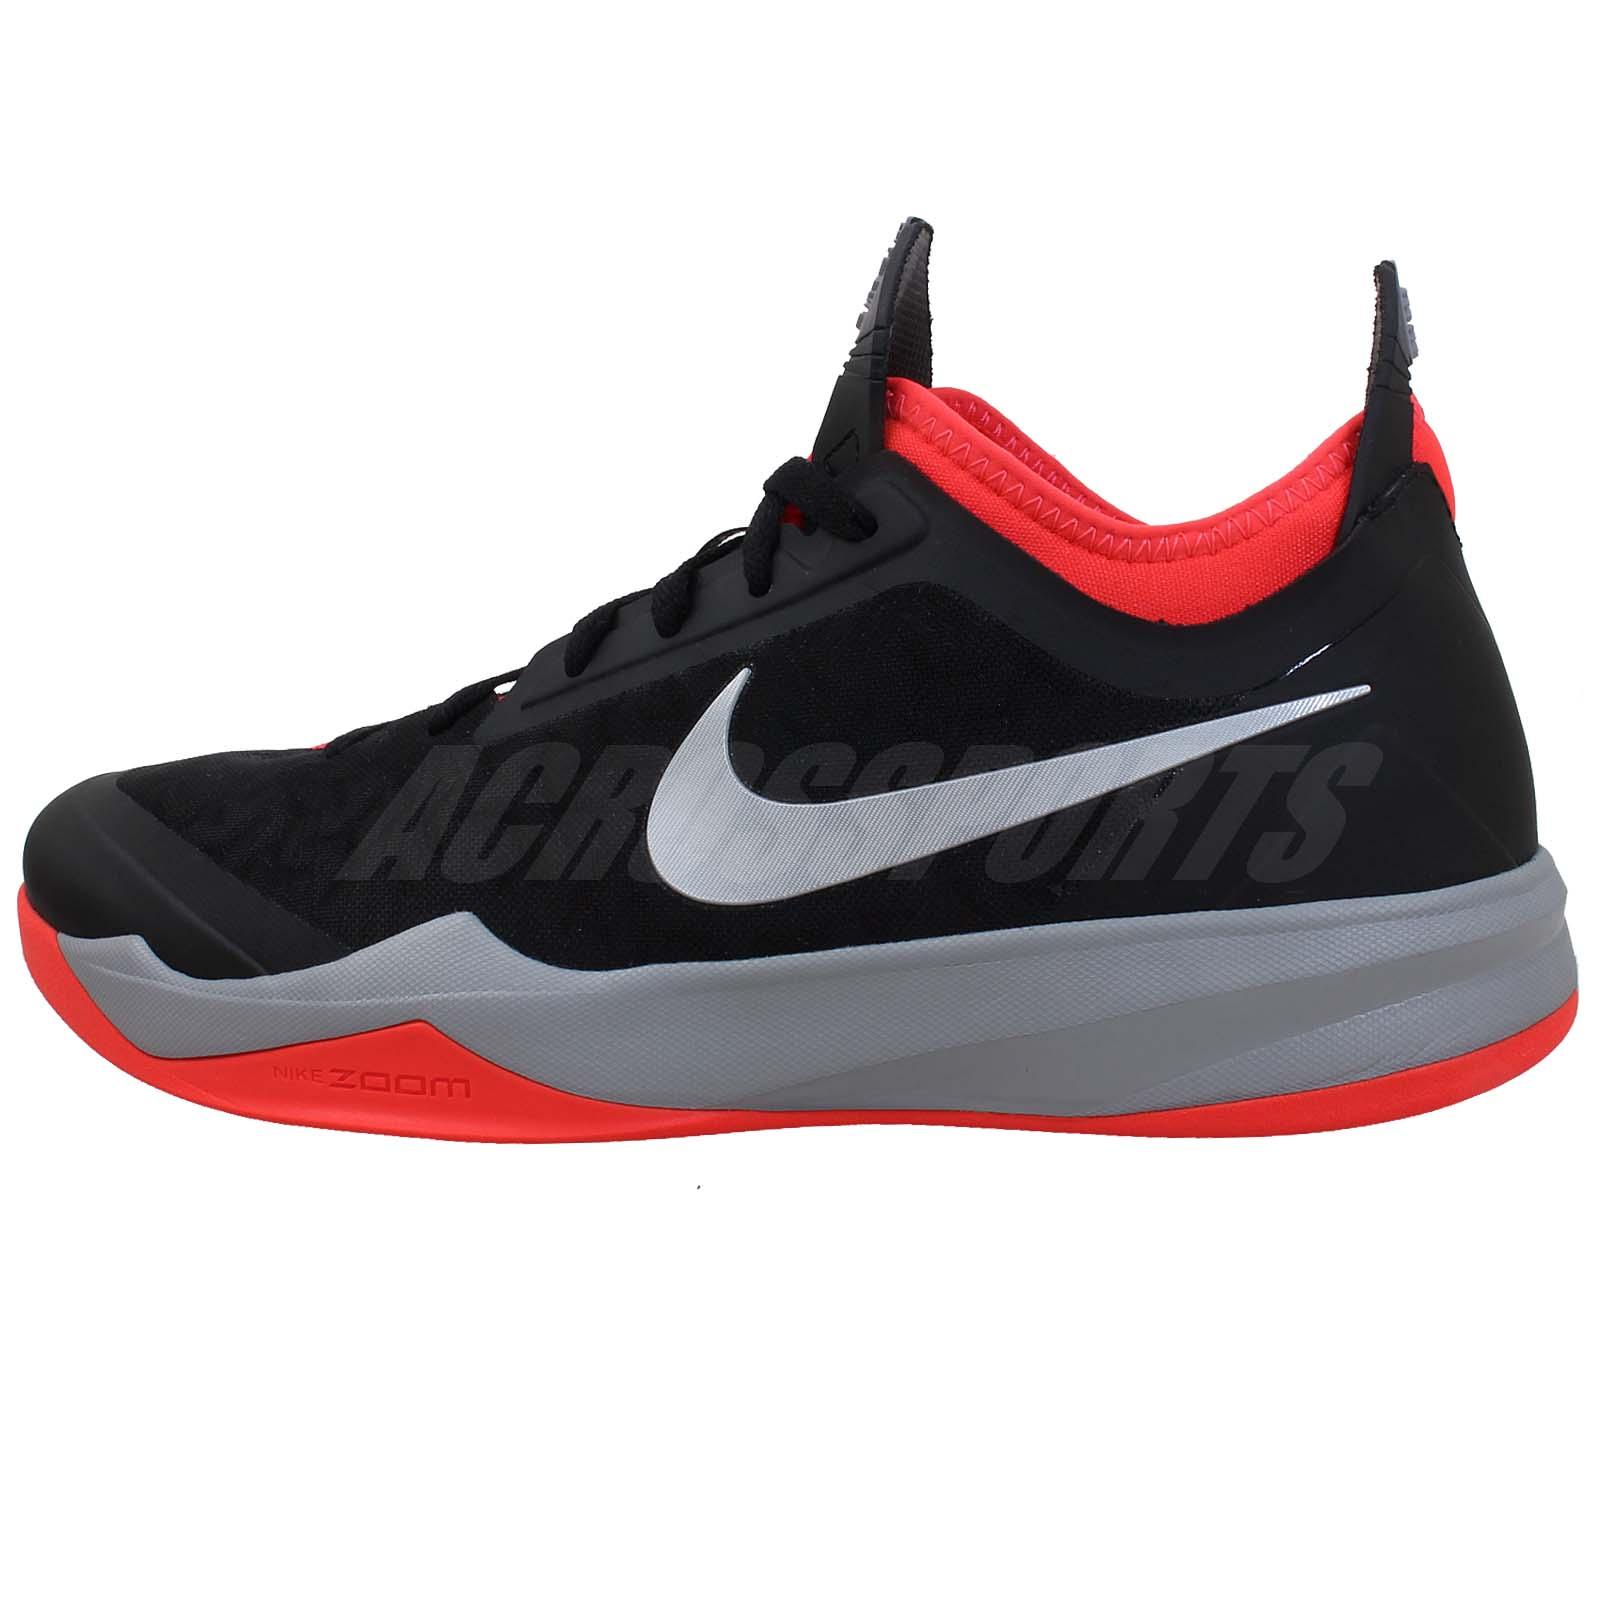 0e6c1ea0aec James Harden Nike Shoes Camo Black And Red Tiffany Nike Sb High ...